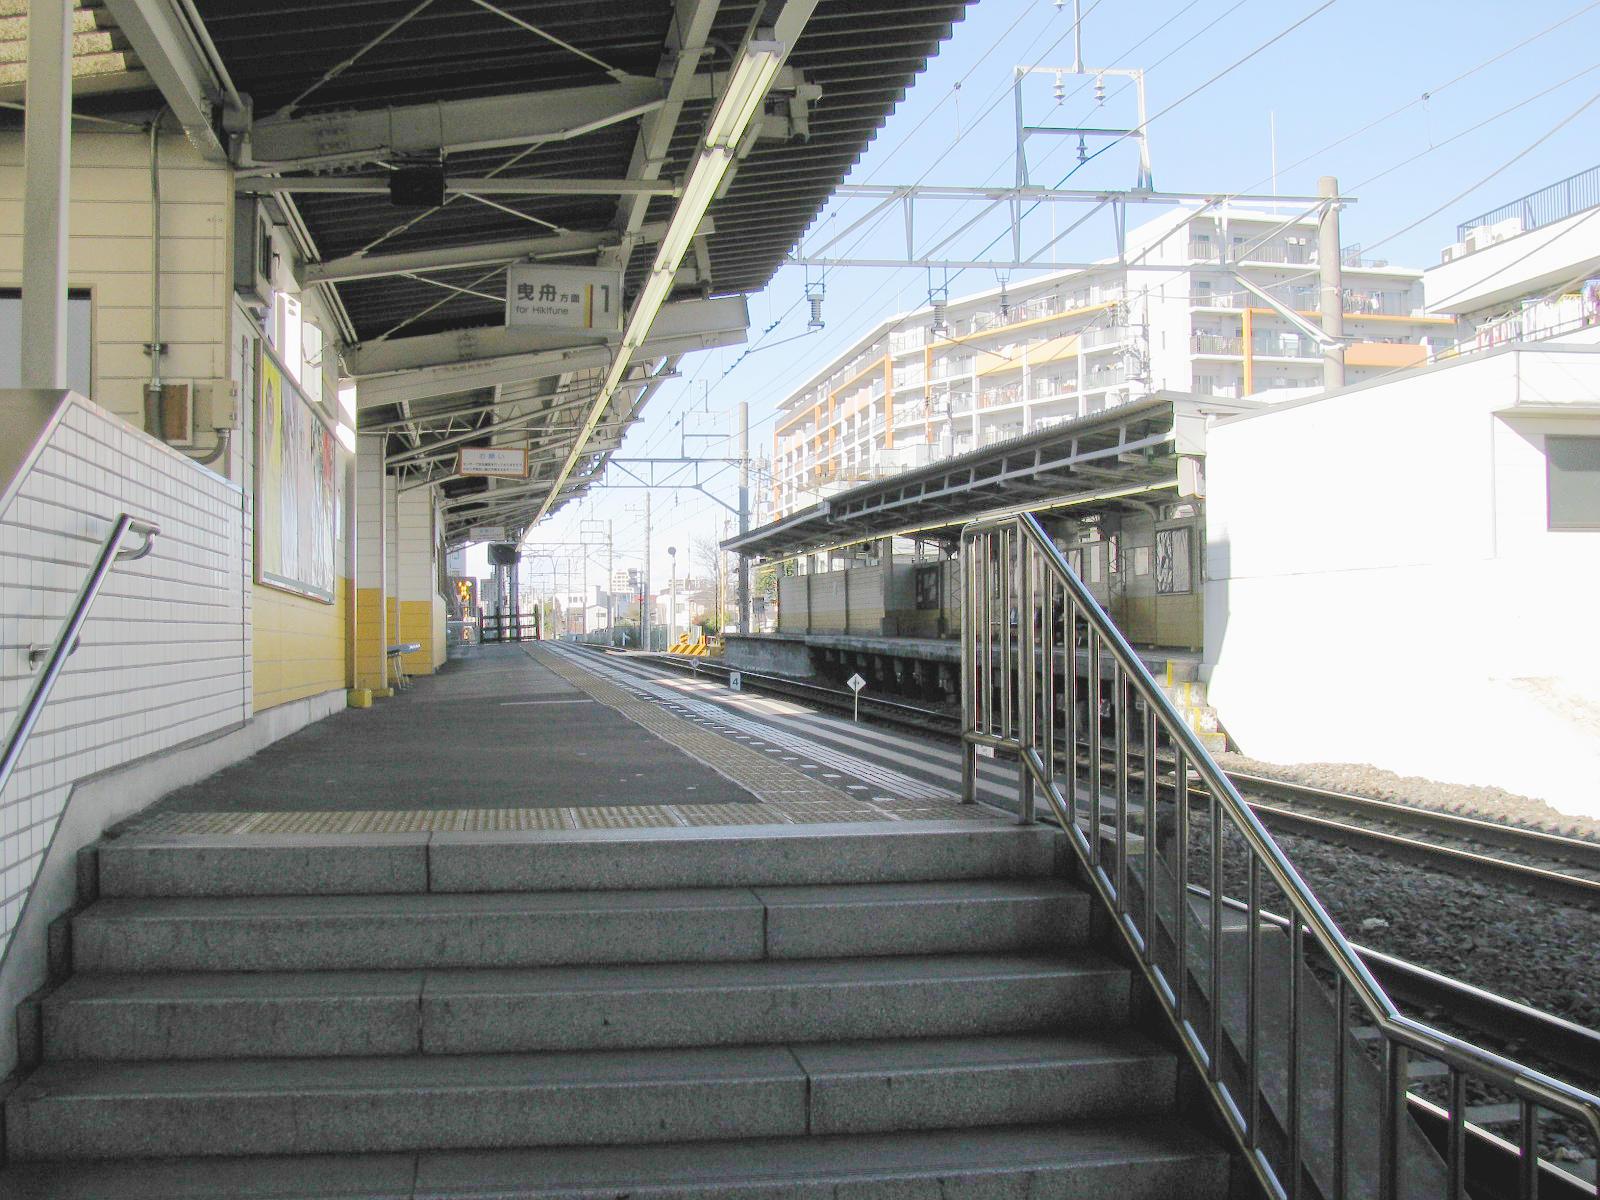 https://upload.wikimedia.org/wikipedia/commons/4/43/Tobu_Omurai_sta_001.jpg